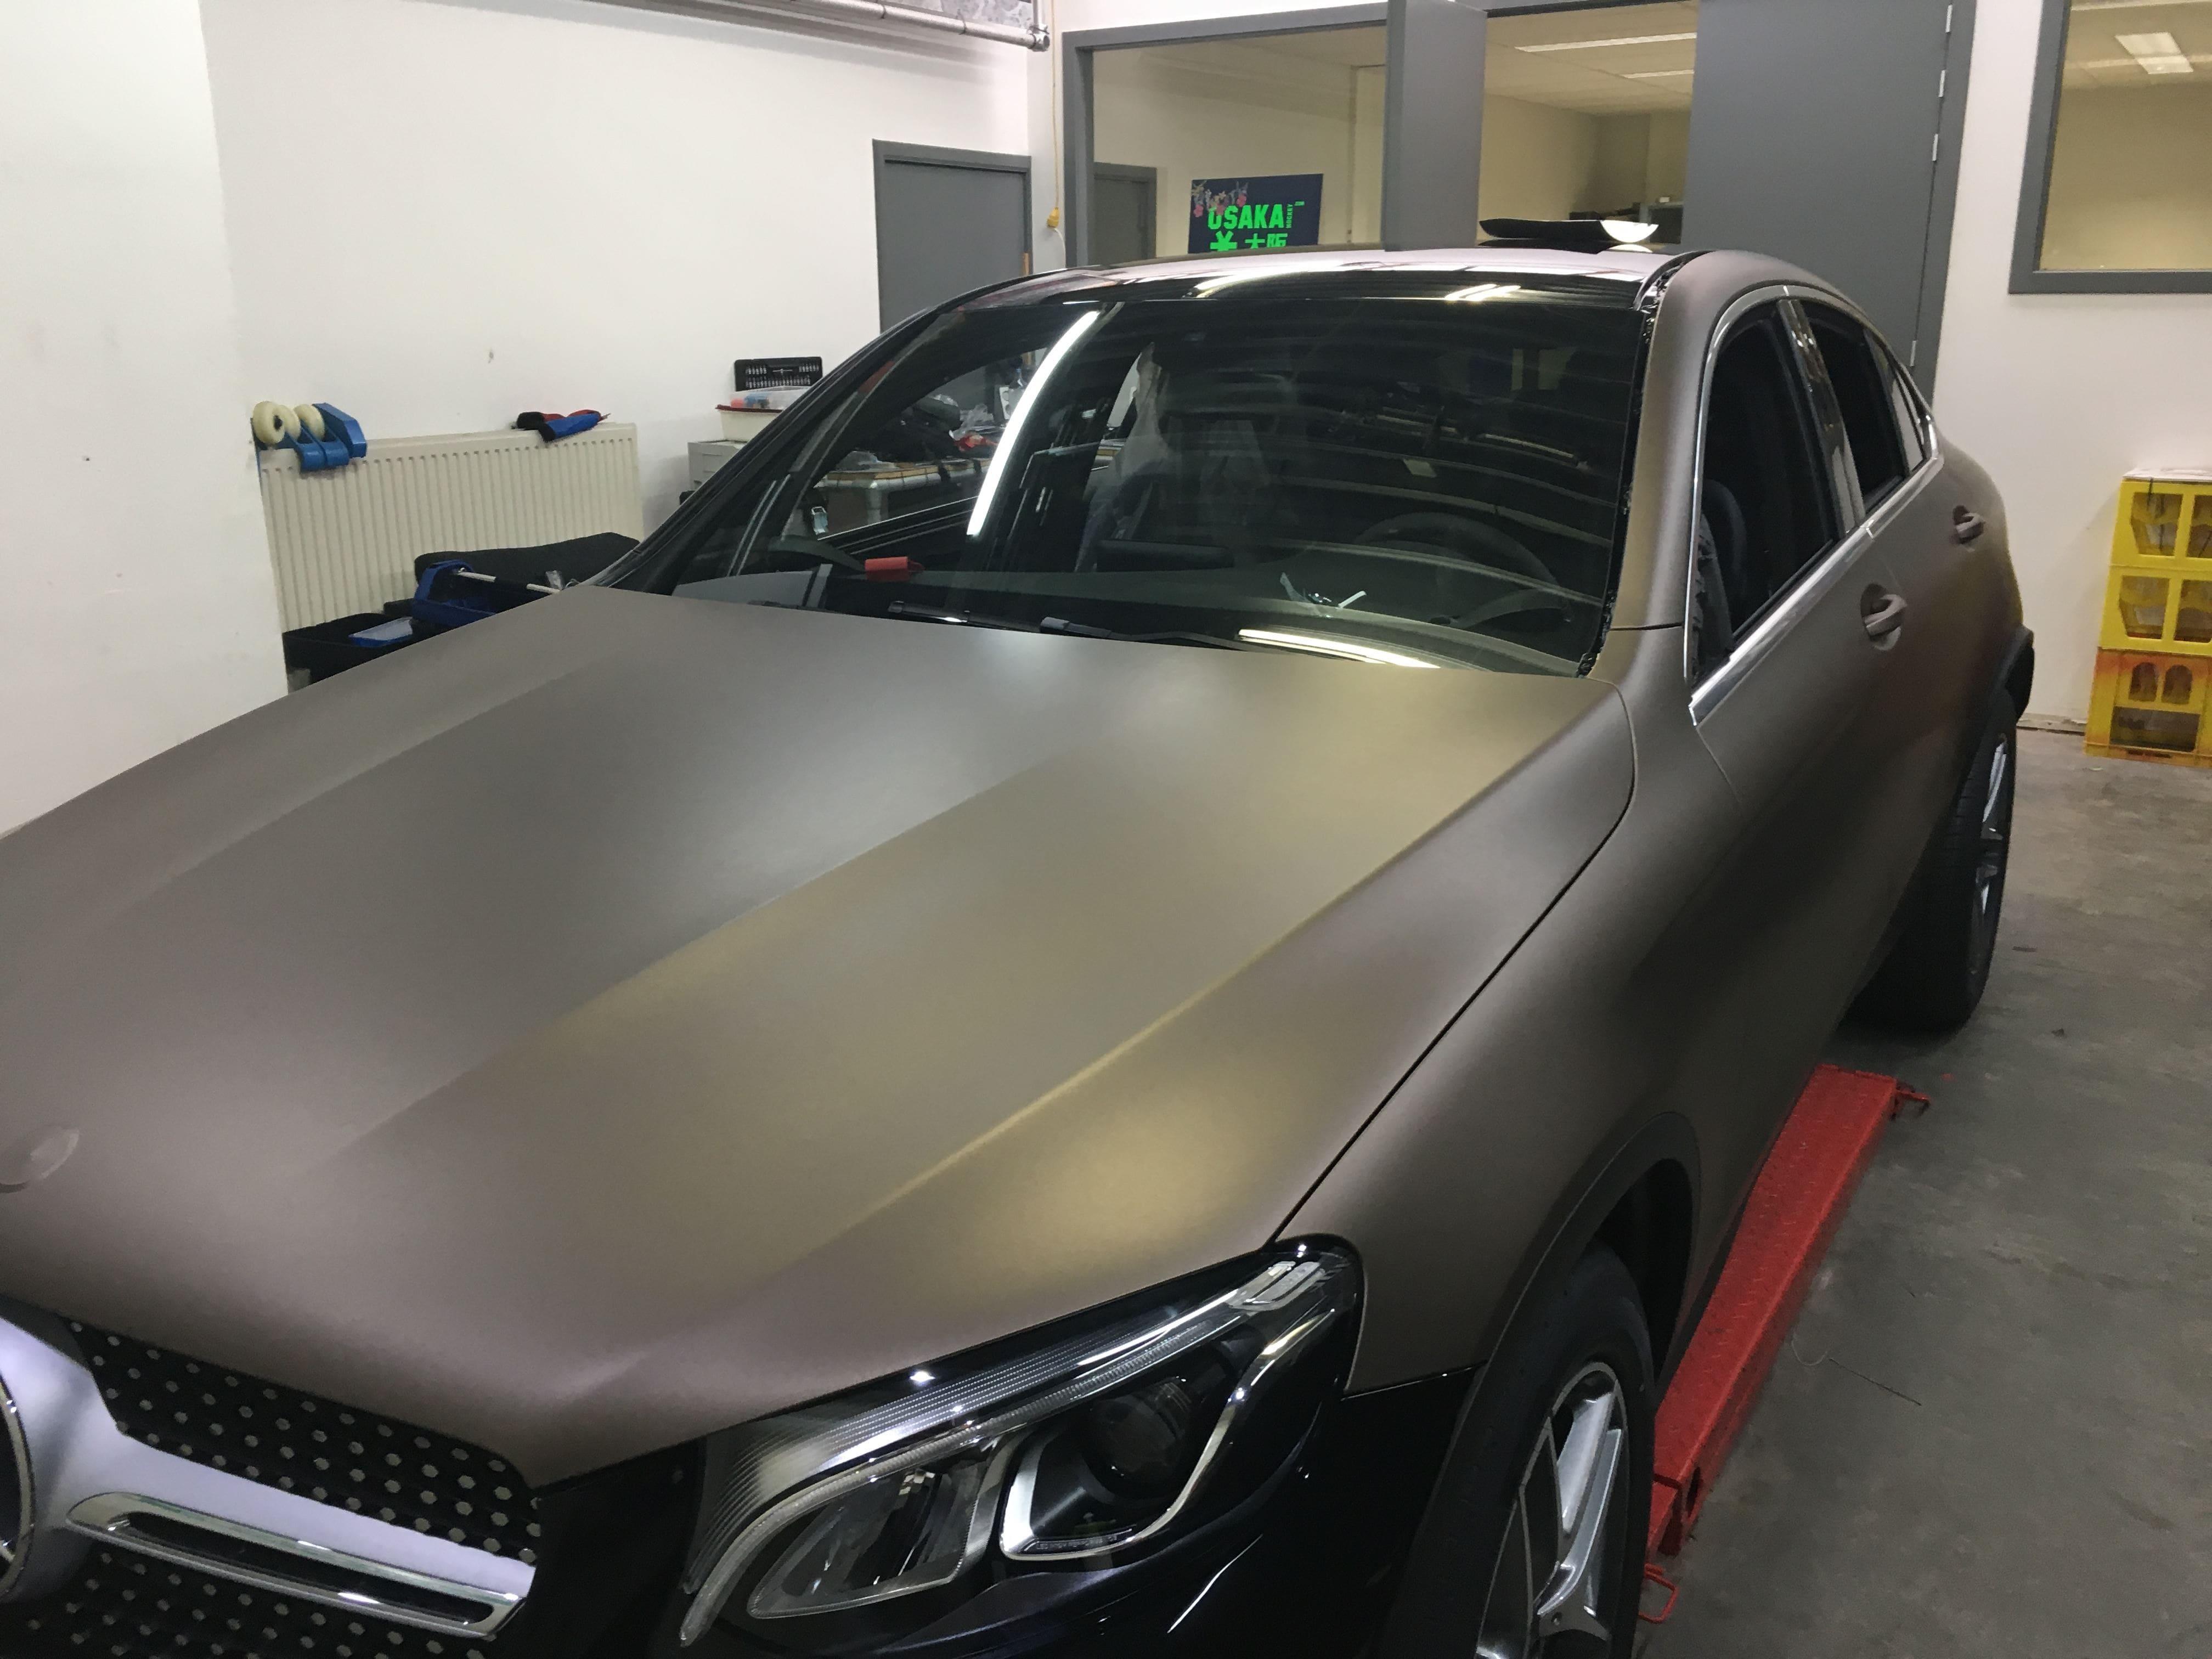 Mercedes GLC Coupe Matte metallic brown, Carwrapping door Wrapmyride.nu Foto-nr:9382, ©2021